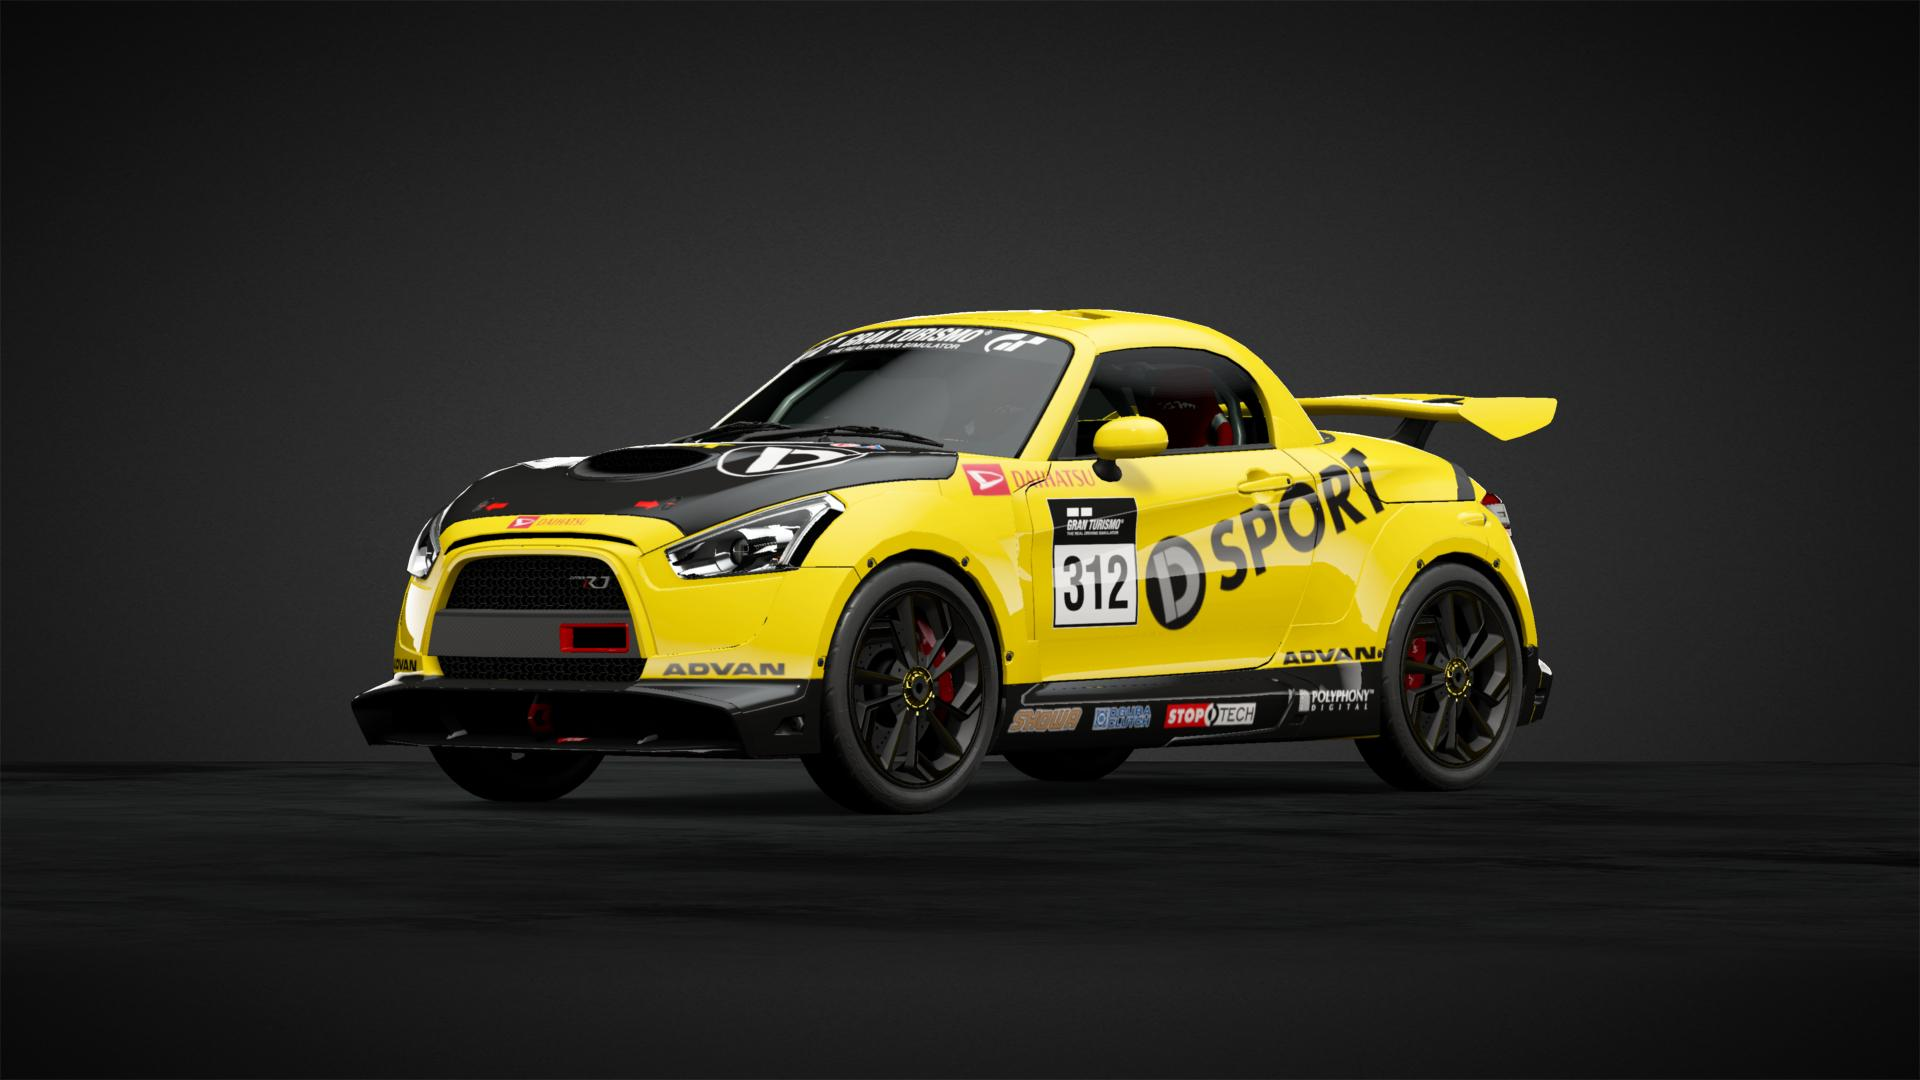 Dsport Daihatsu Racing Car Livery By Ghostrider135 Community